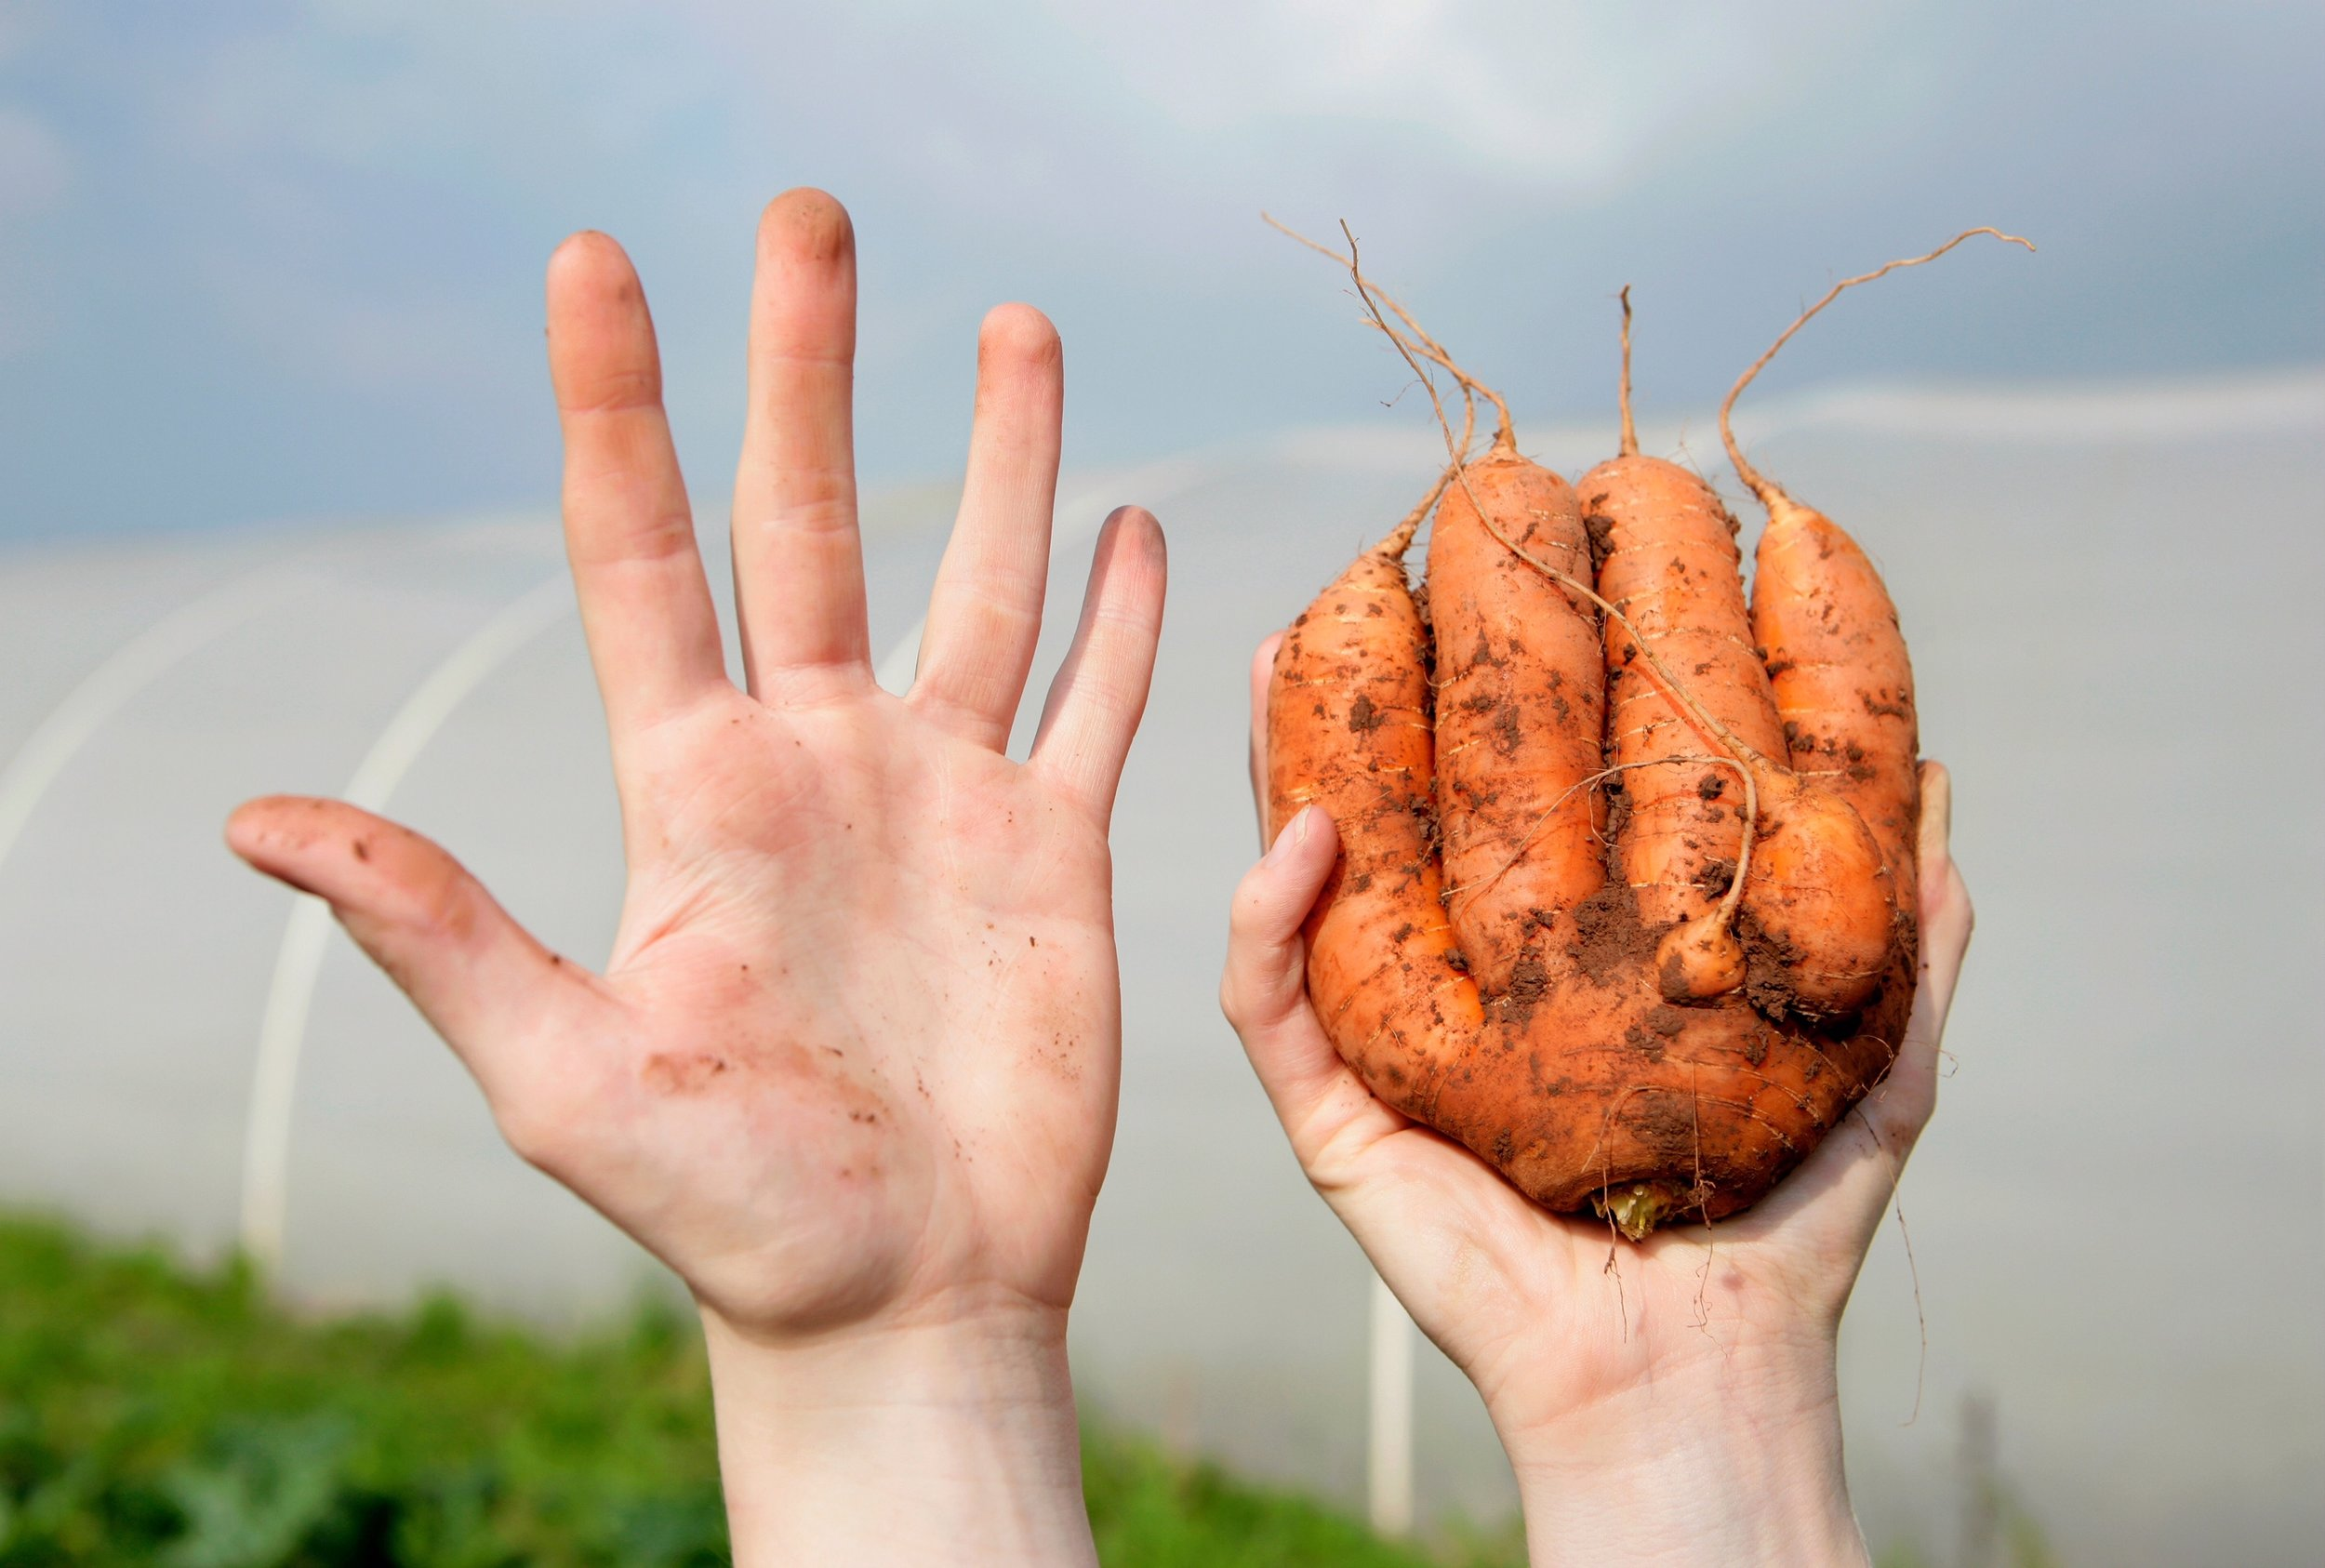 hand and odd carrot shutterstock_740216671.jpg